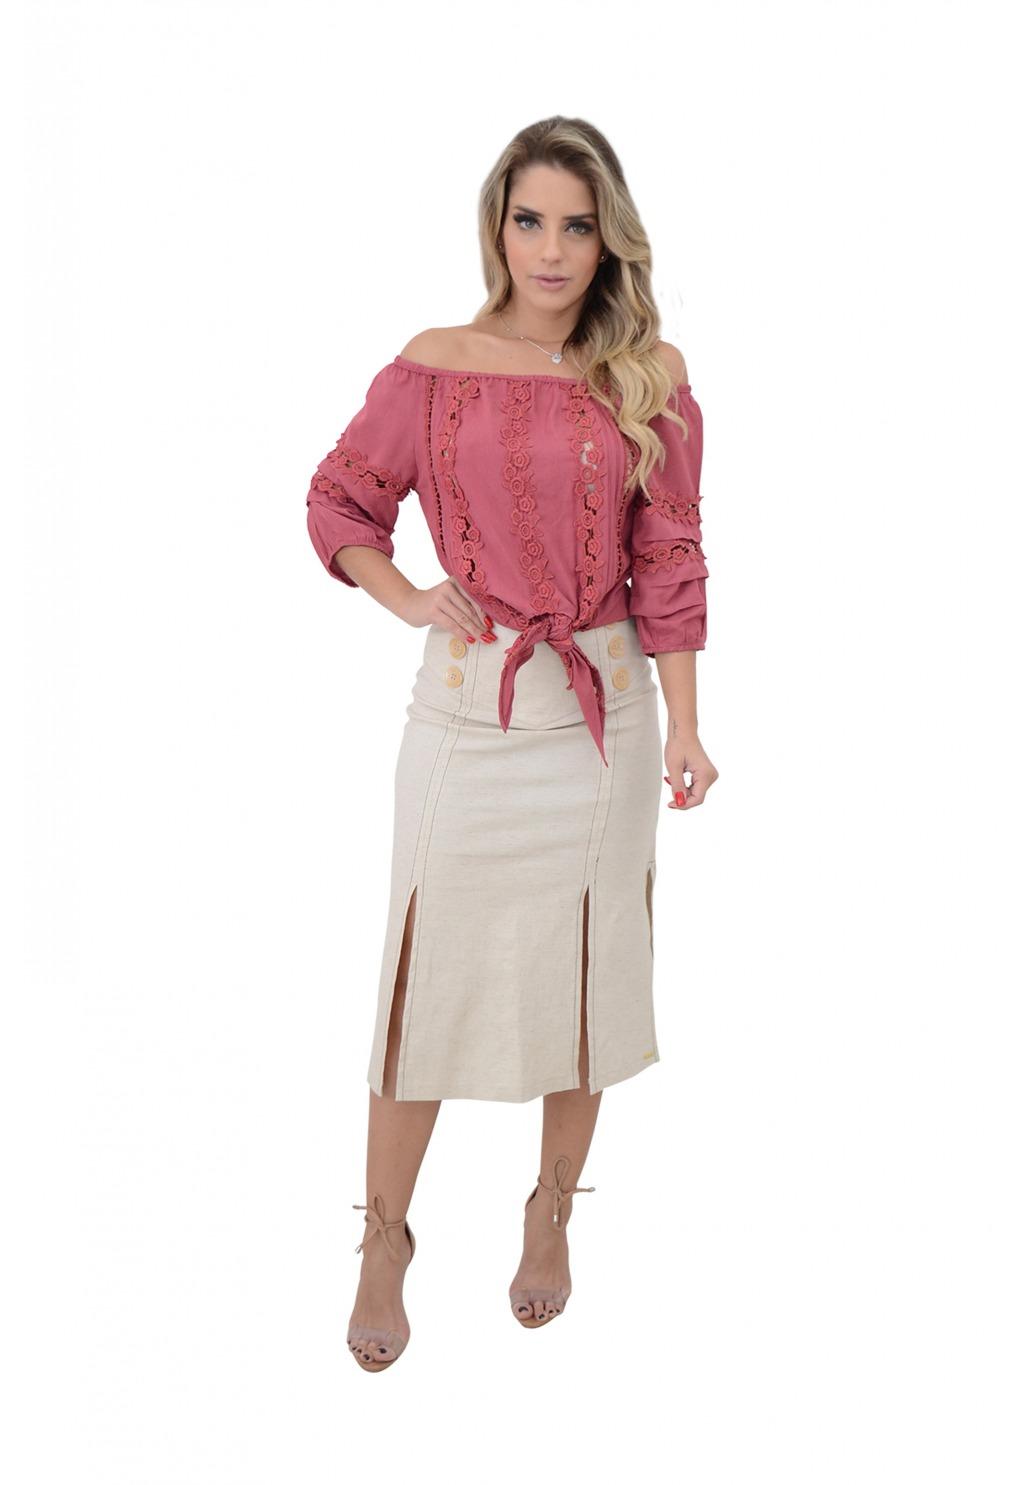 Blusa Mamorena ombro a ombro detalhe guipir